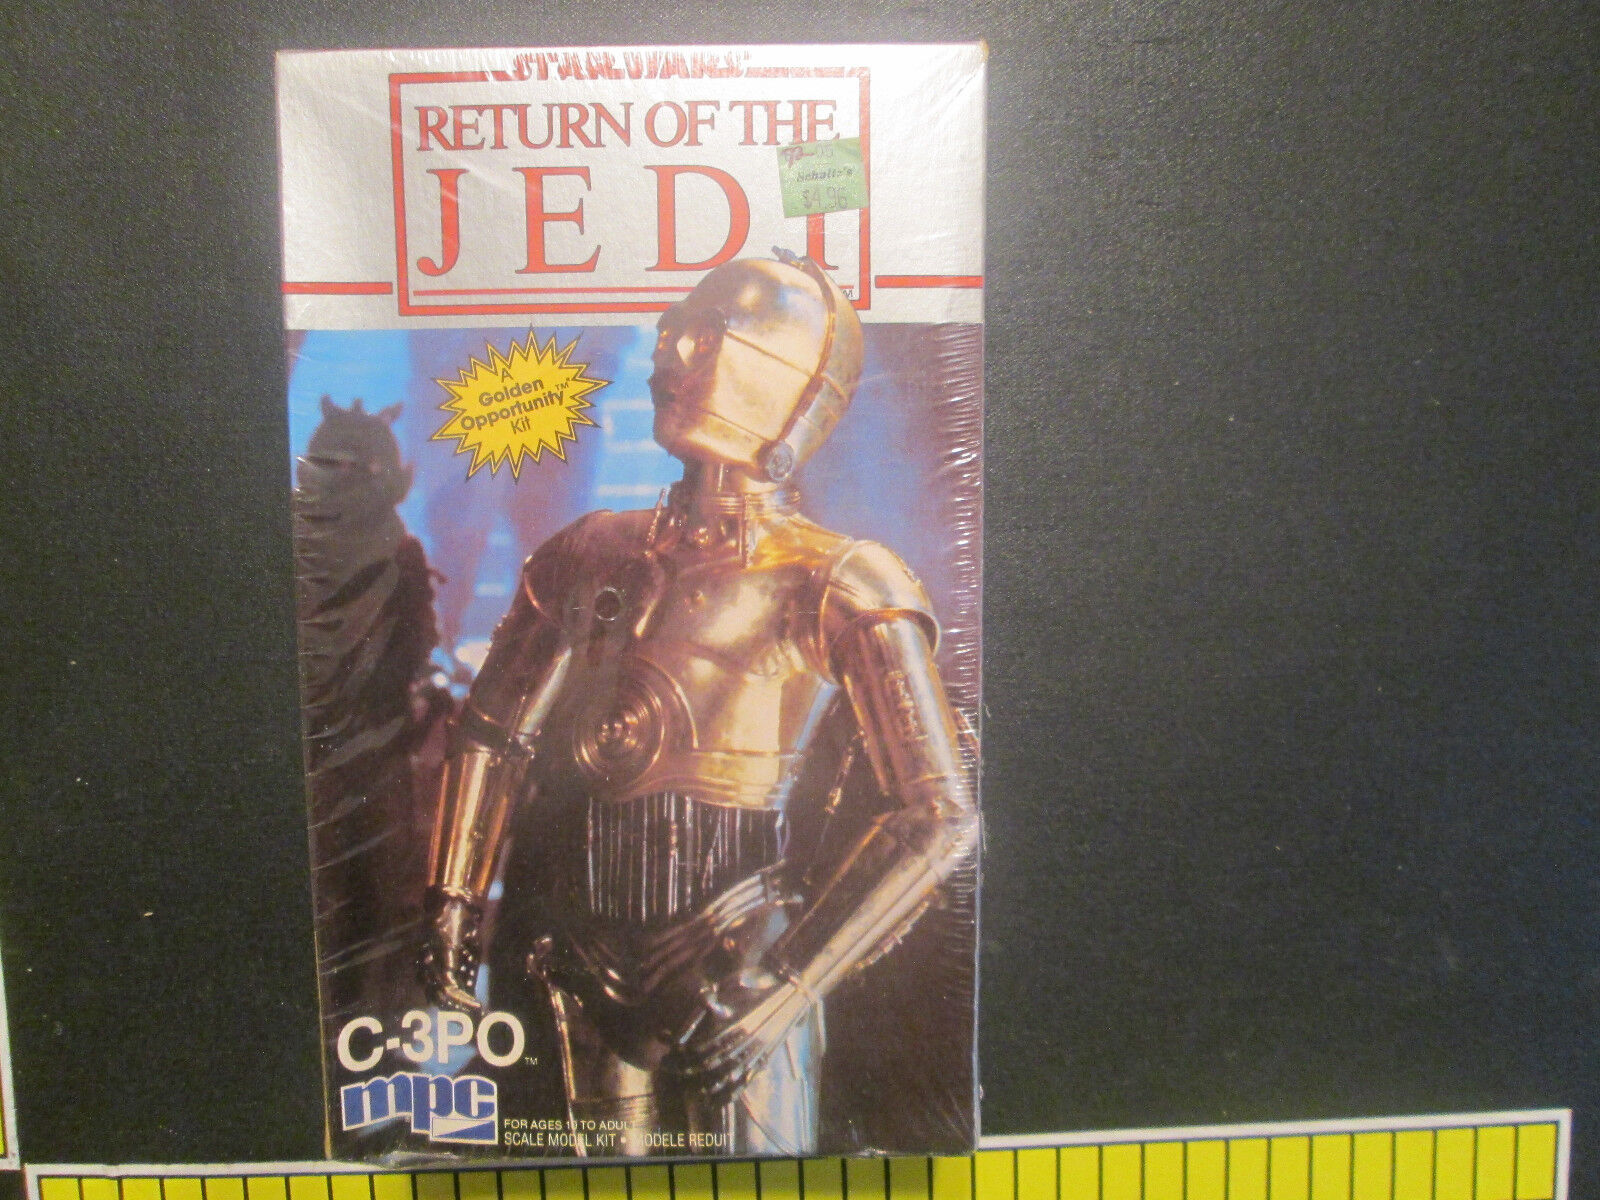 Star Wars redJ C-3PO Scale Model Kit by MPC